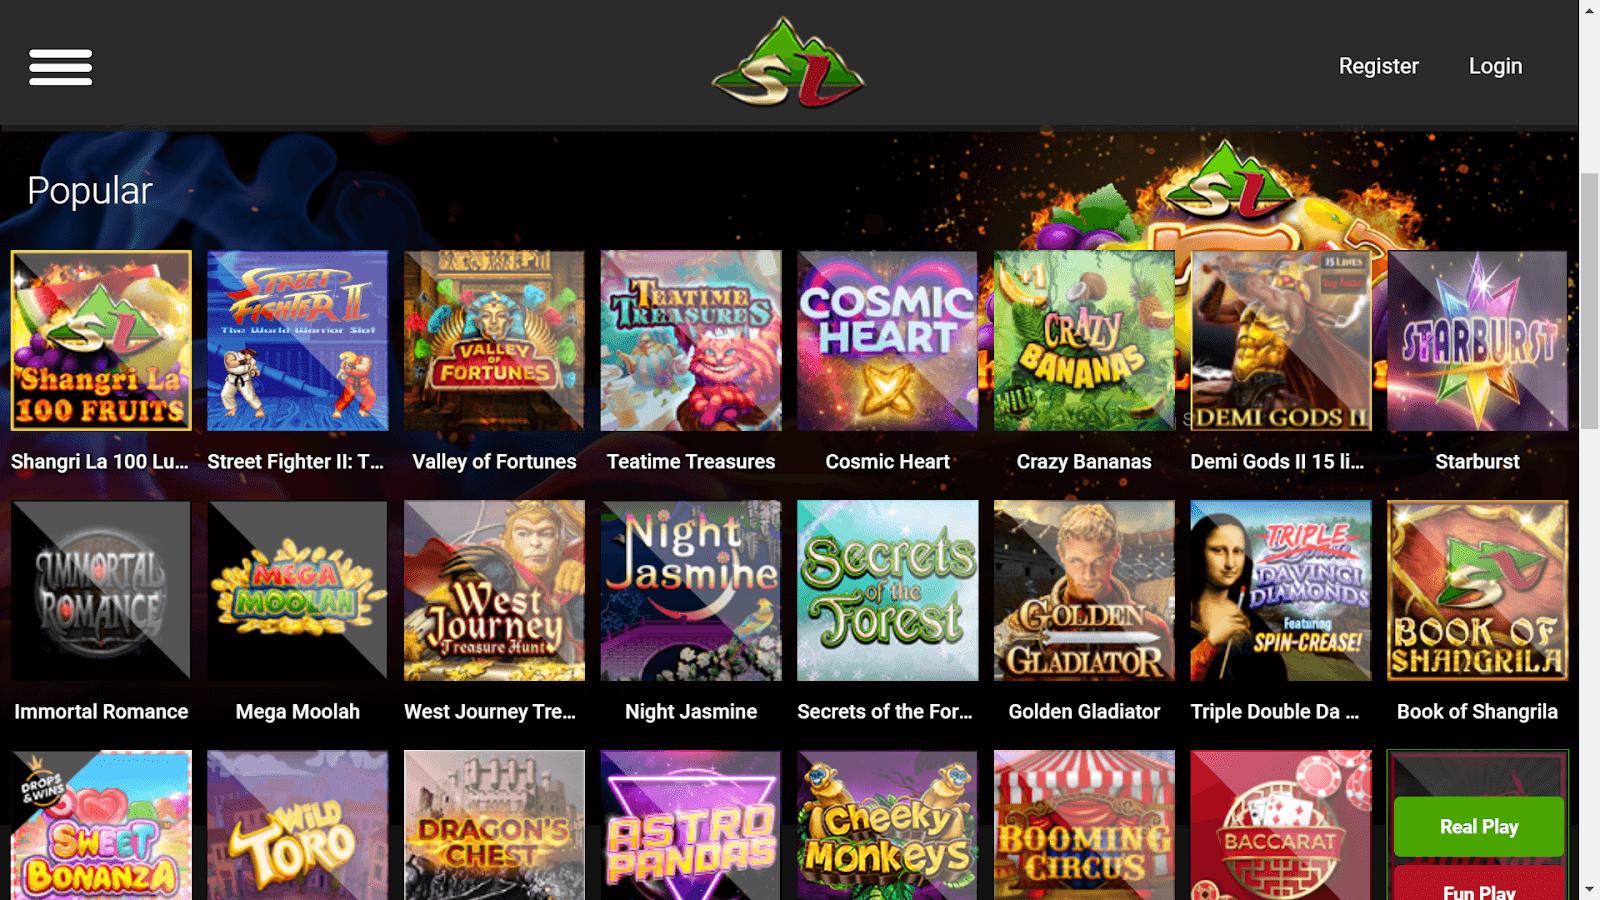 shangri la live site casino